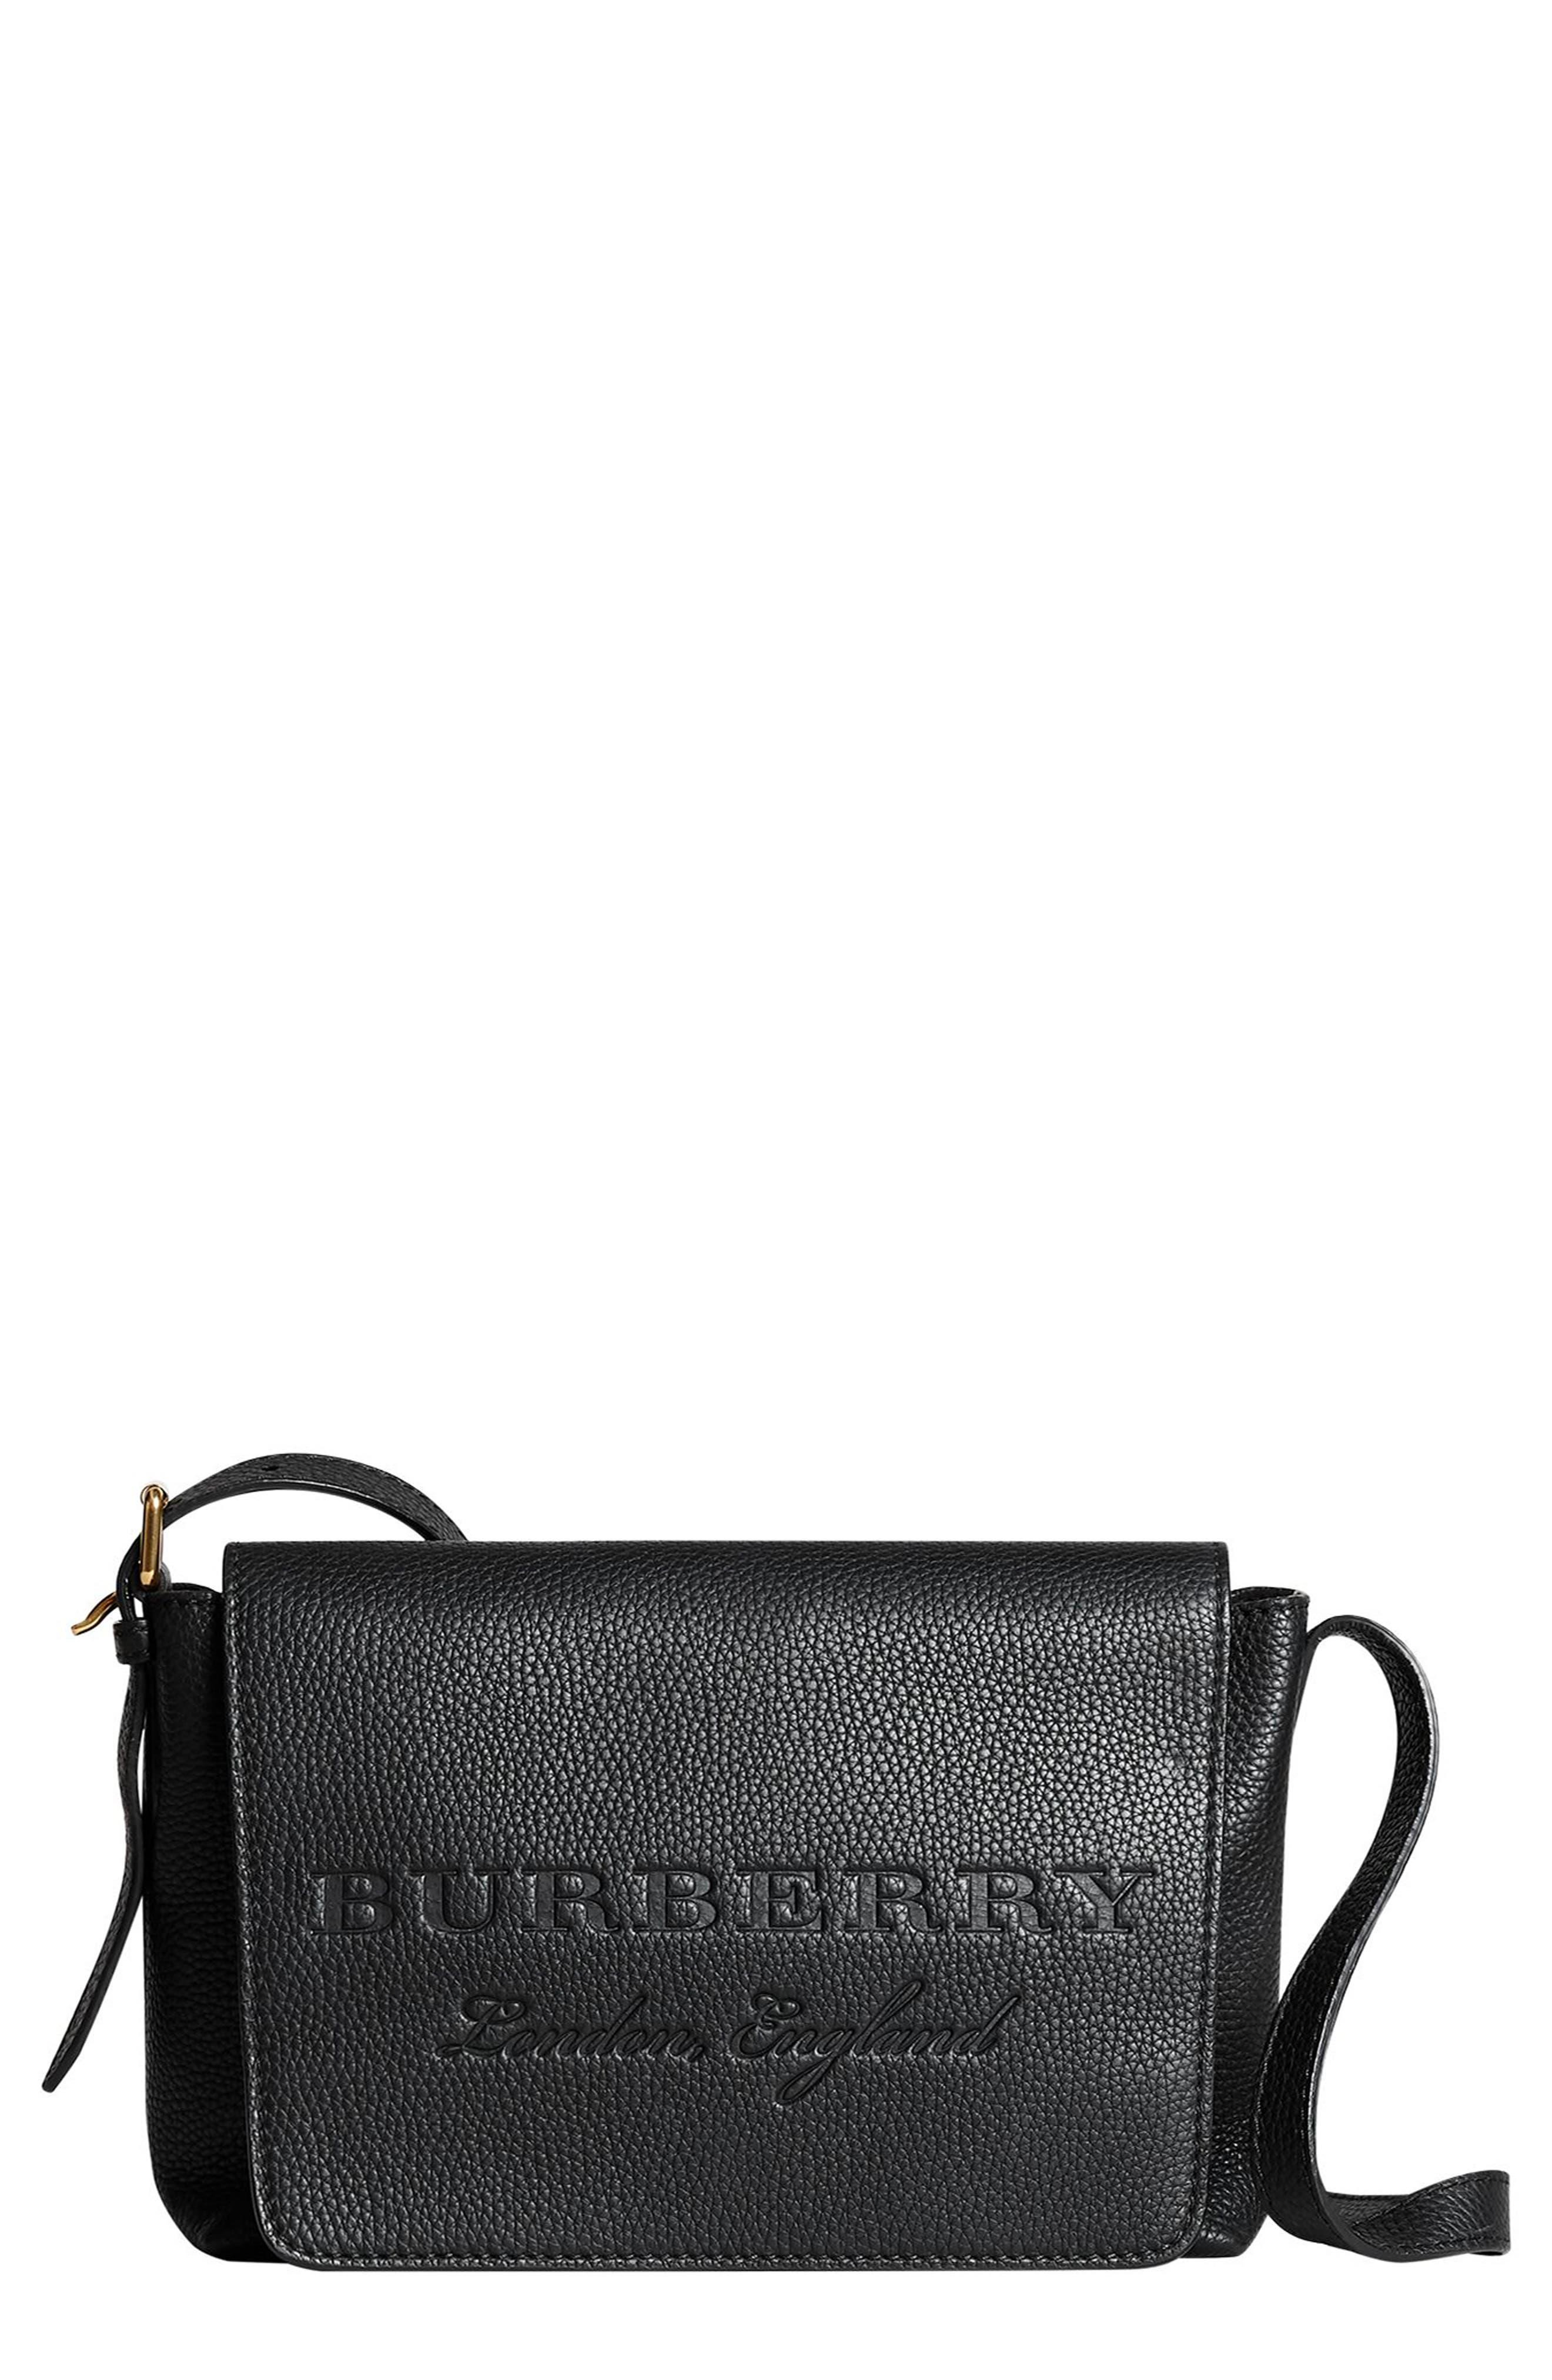 Small Burleigh Leather Crossbody Bag,                             Main thumbnail 1, color,                             001